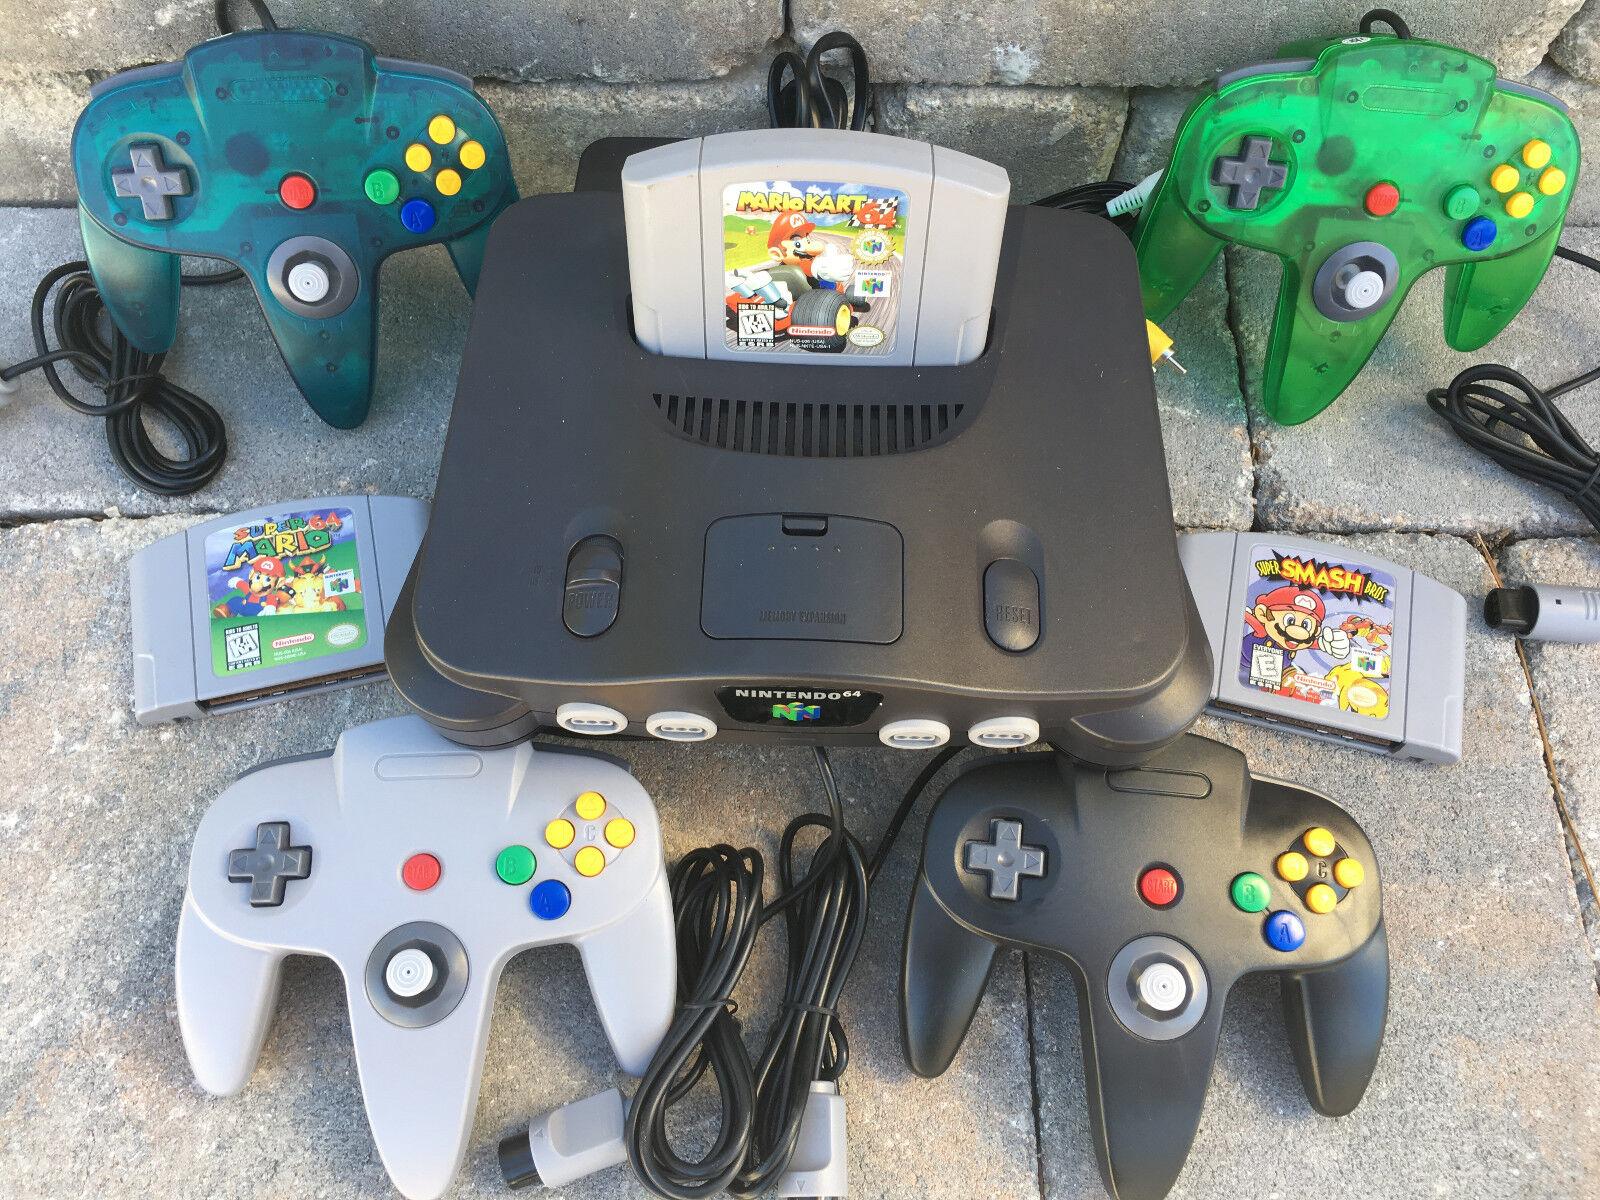 Купить Nintendo (Console) TTX (Controllers) - N64 NINTENDO 64 CONSOLE + CONTROLLERS + BONUS OFFER- SUPER MARIO KART SMASH BROS